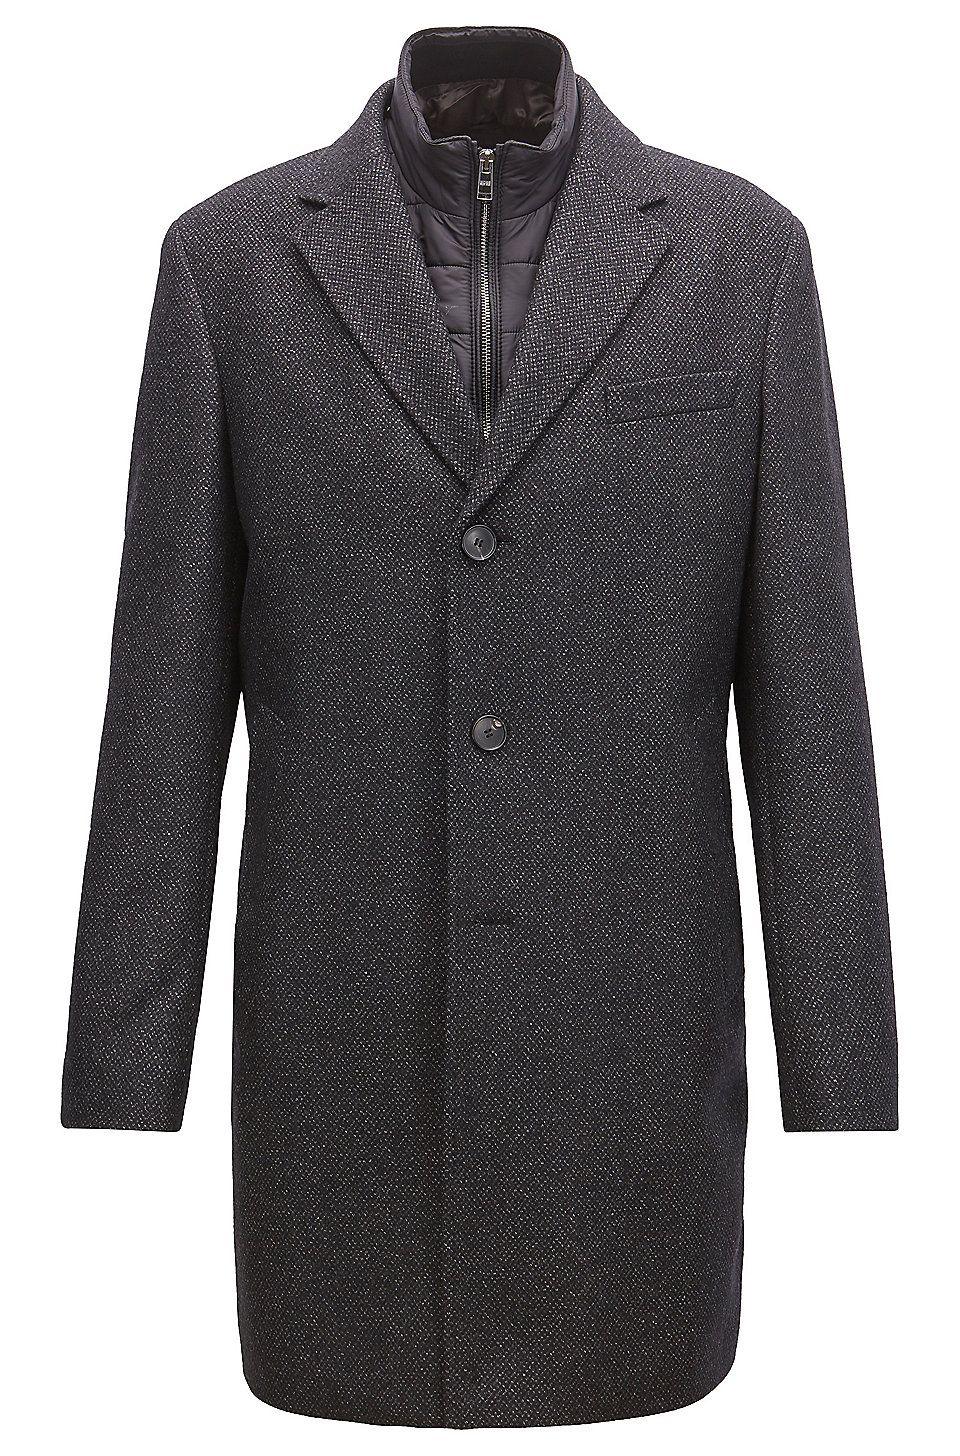 Hugo Boss Slim Fit Wool Blend Coat With Detachable Inner Bib Dark Grey Formal Coats From Boss For Men In The Official Hu Wool Blend Coat Slim Fit Formal Coat [ 1456 x 960 Pixel ]